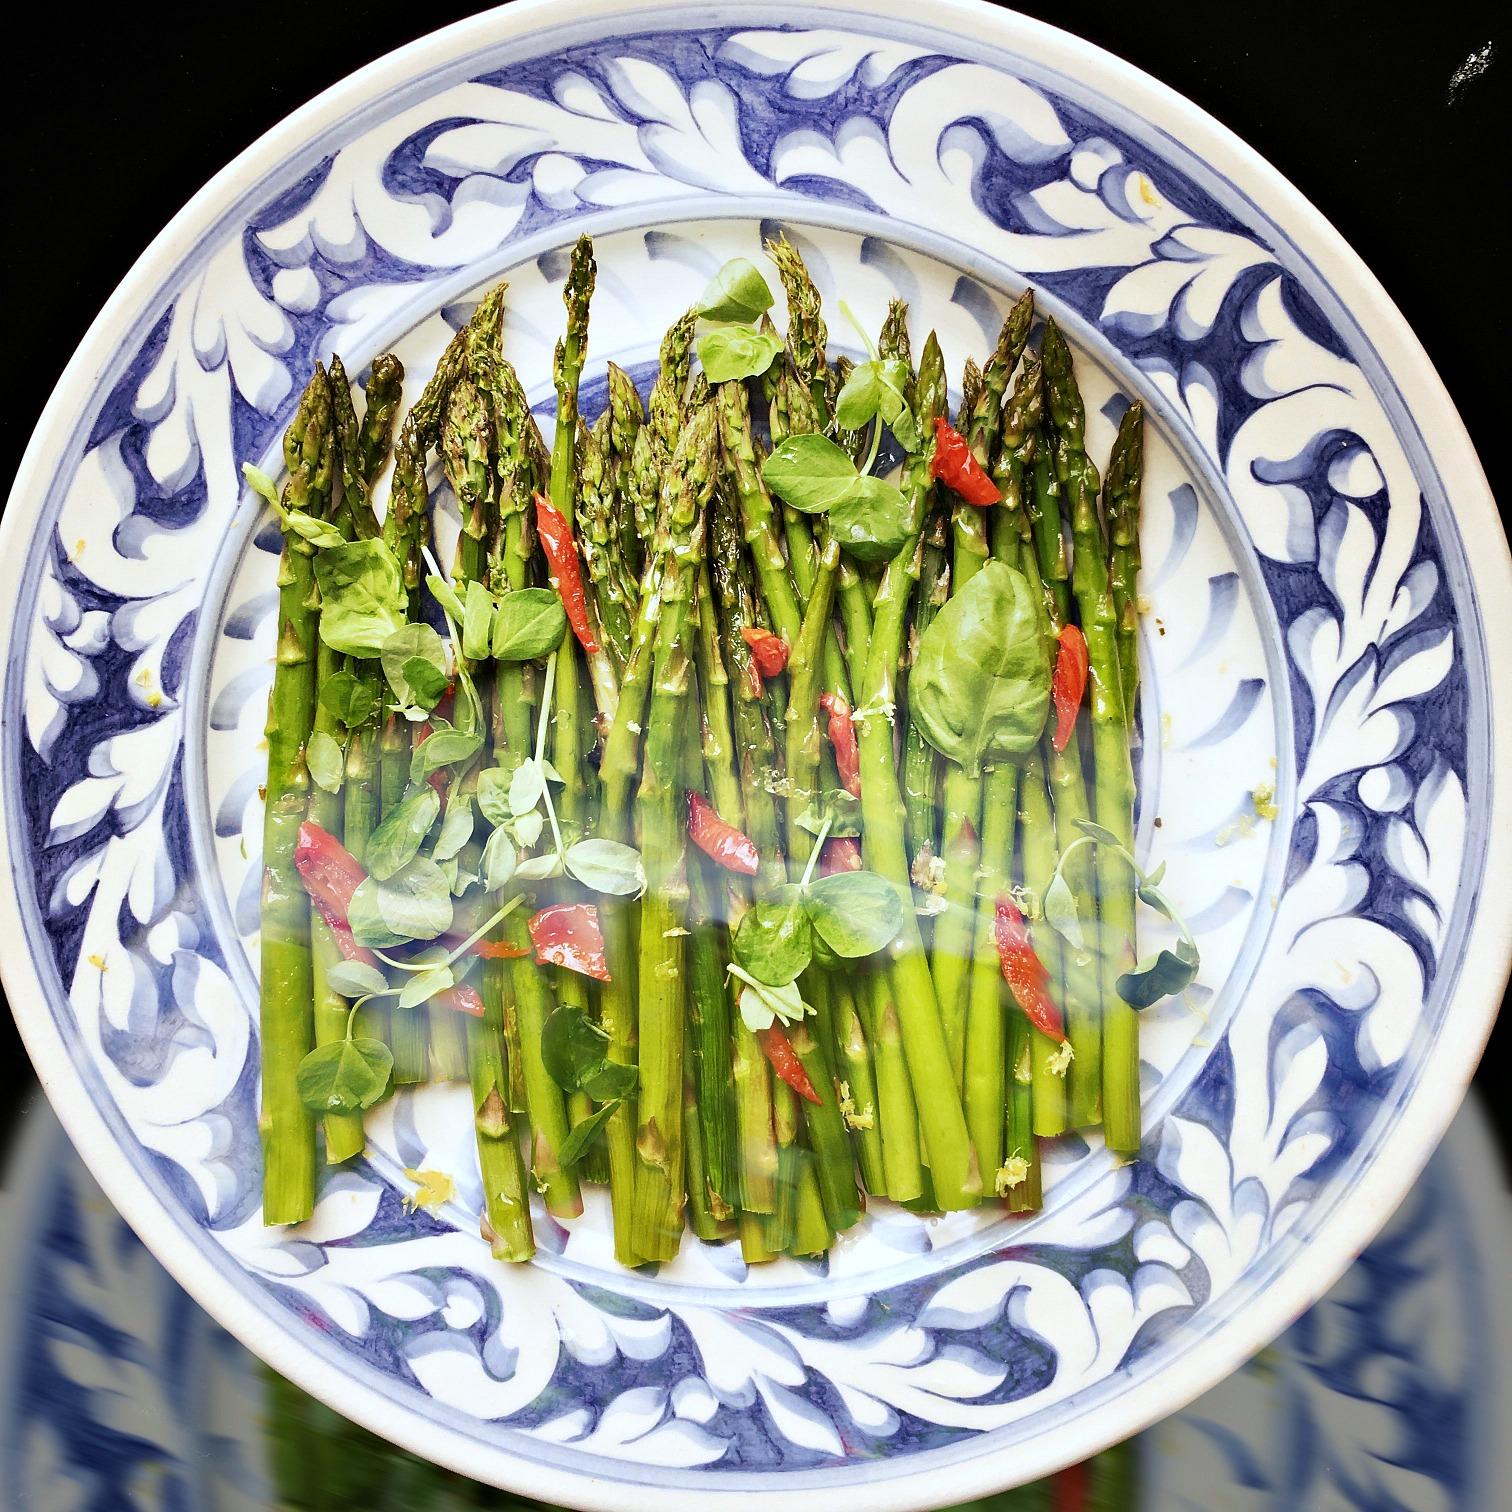 ©Asparagus Salad by Dena T Bray